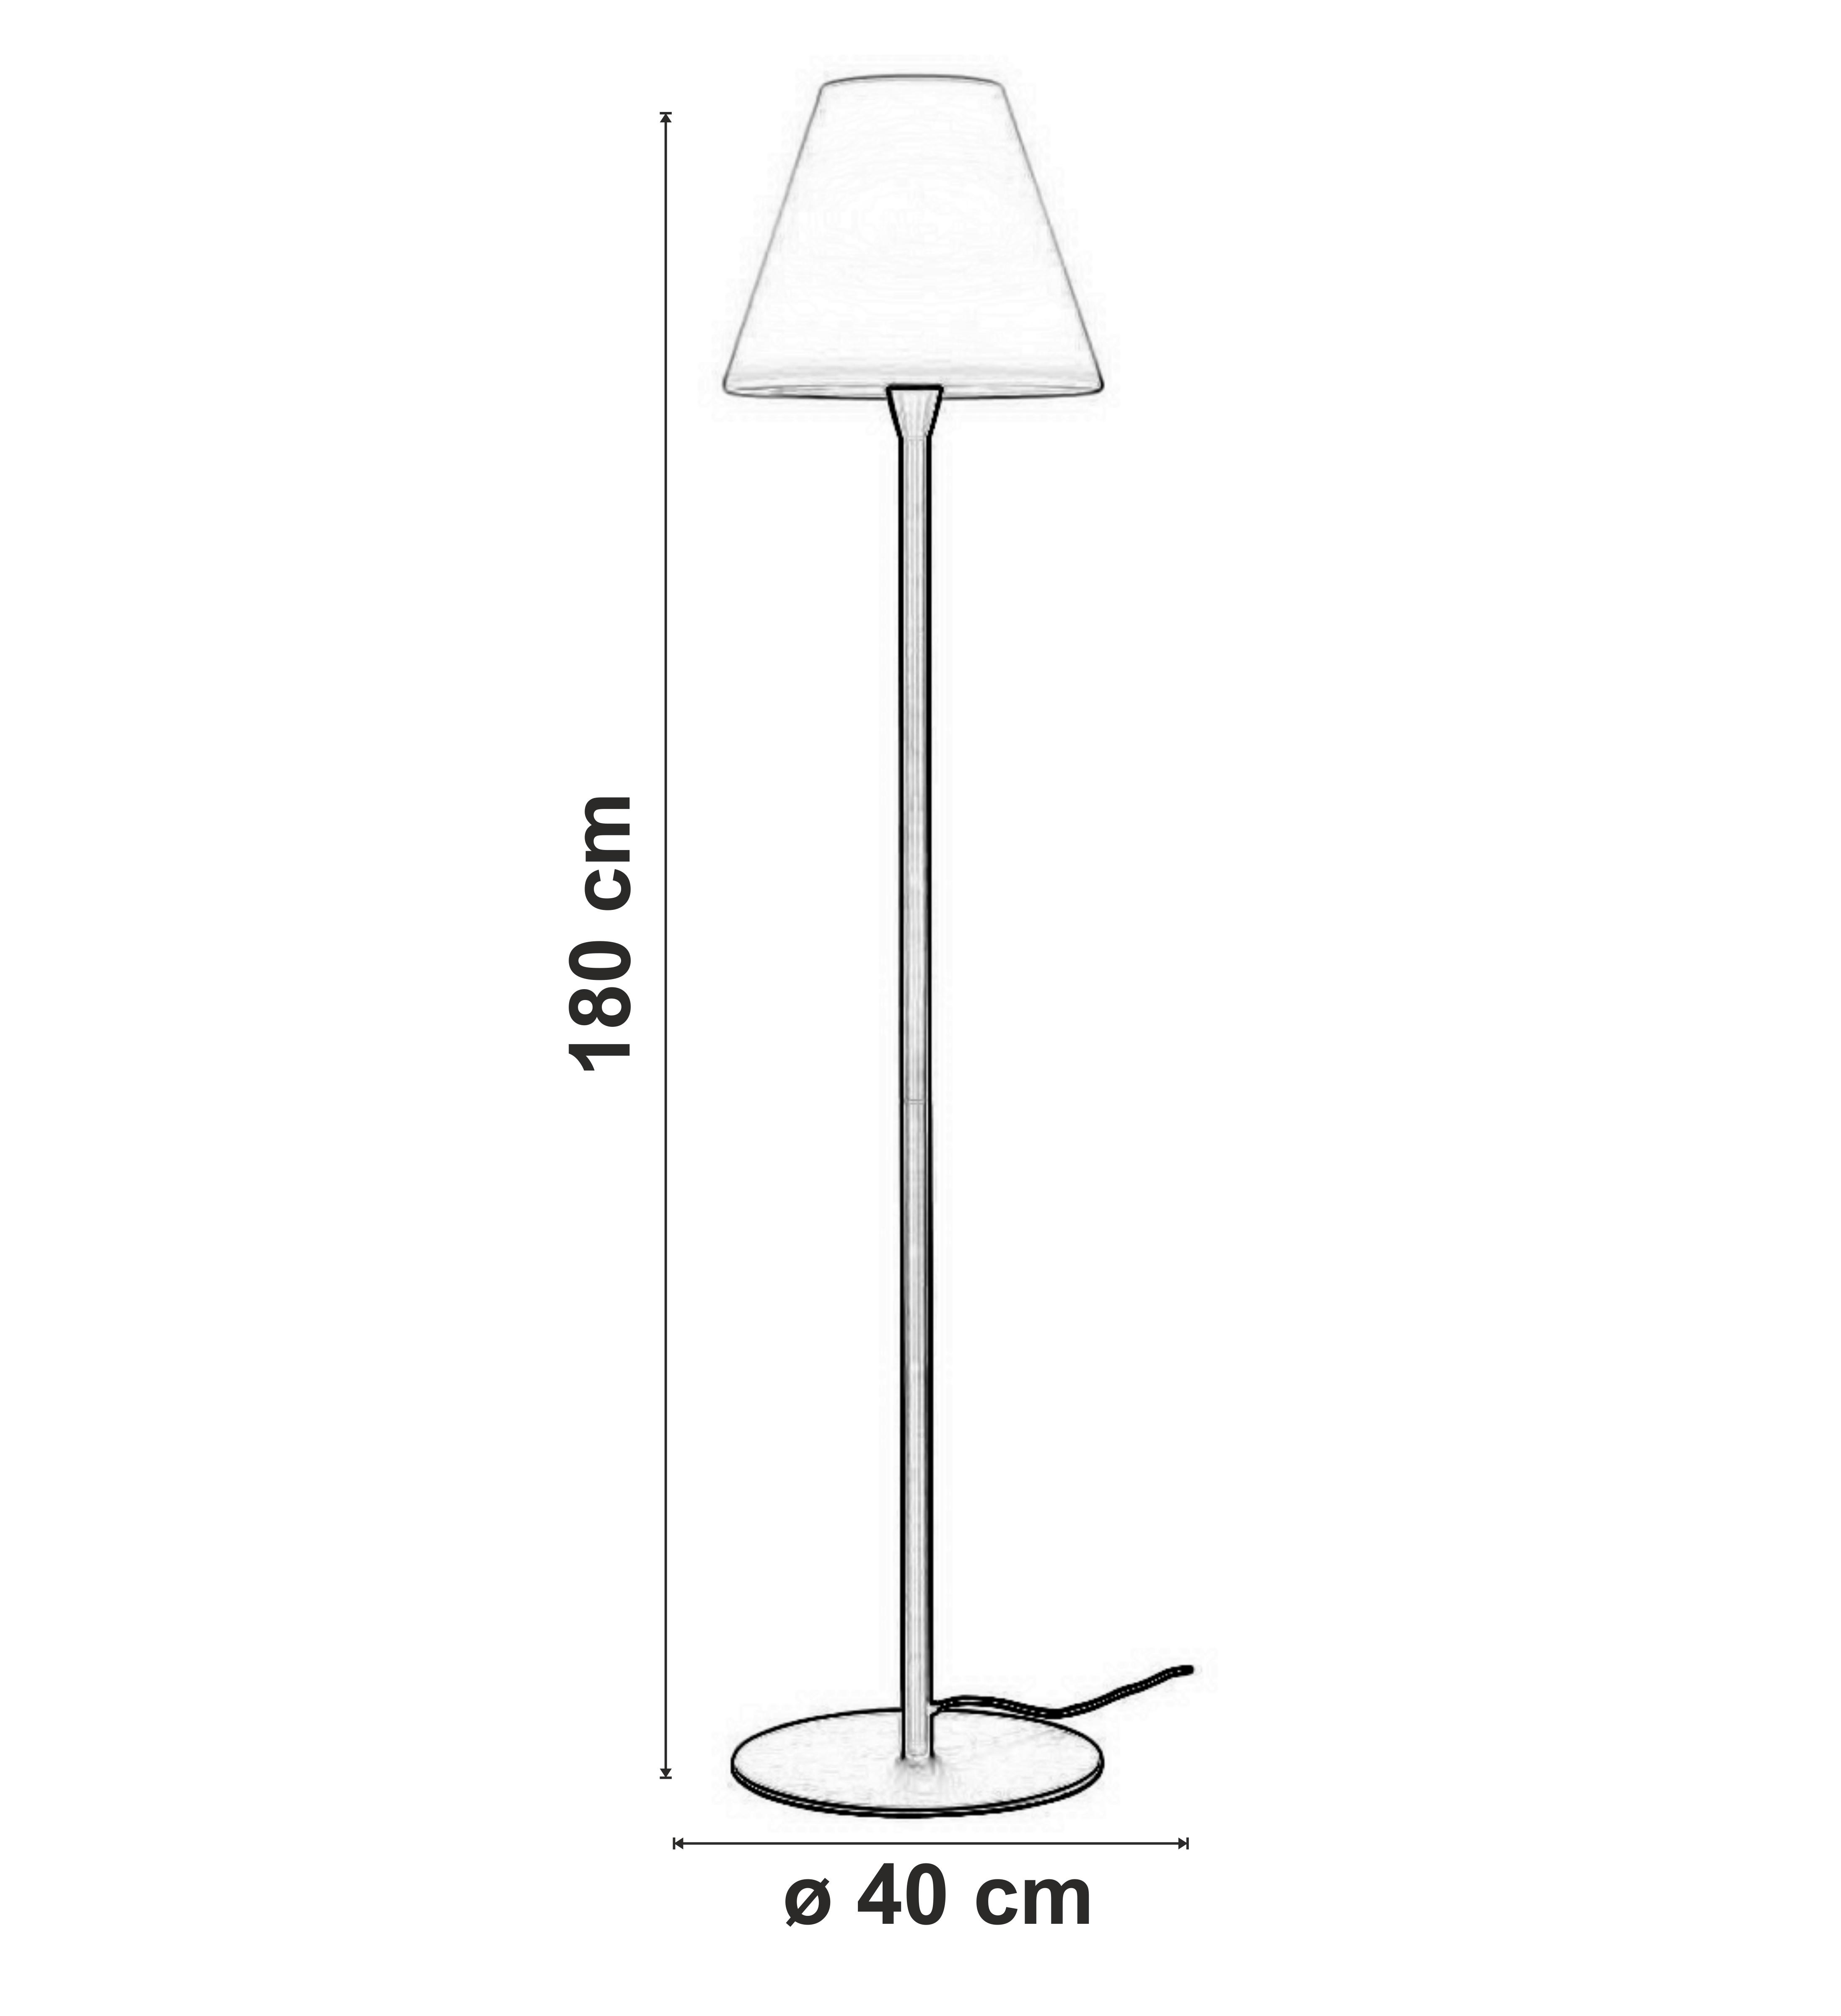 dimensiuni Lampadar pentru exterior Adegan